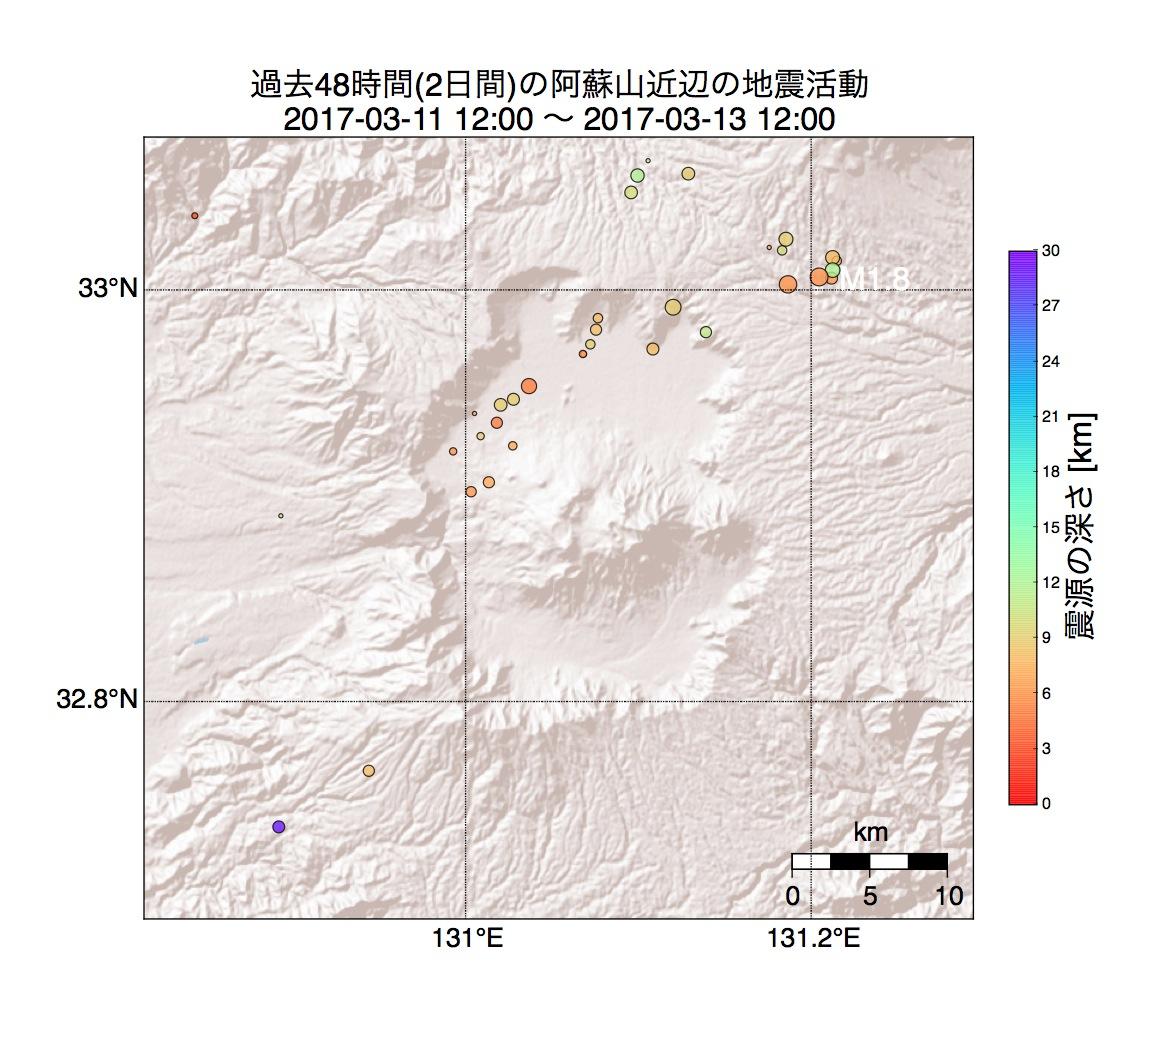 http://jishin.chamu.org/aso/20170313_1.jpg